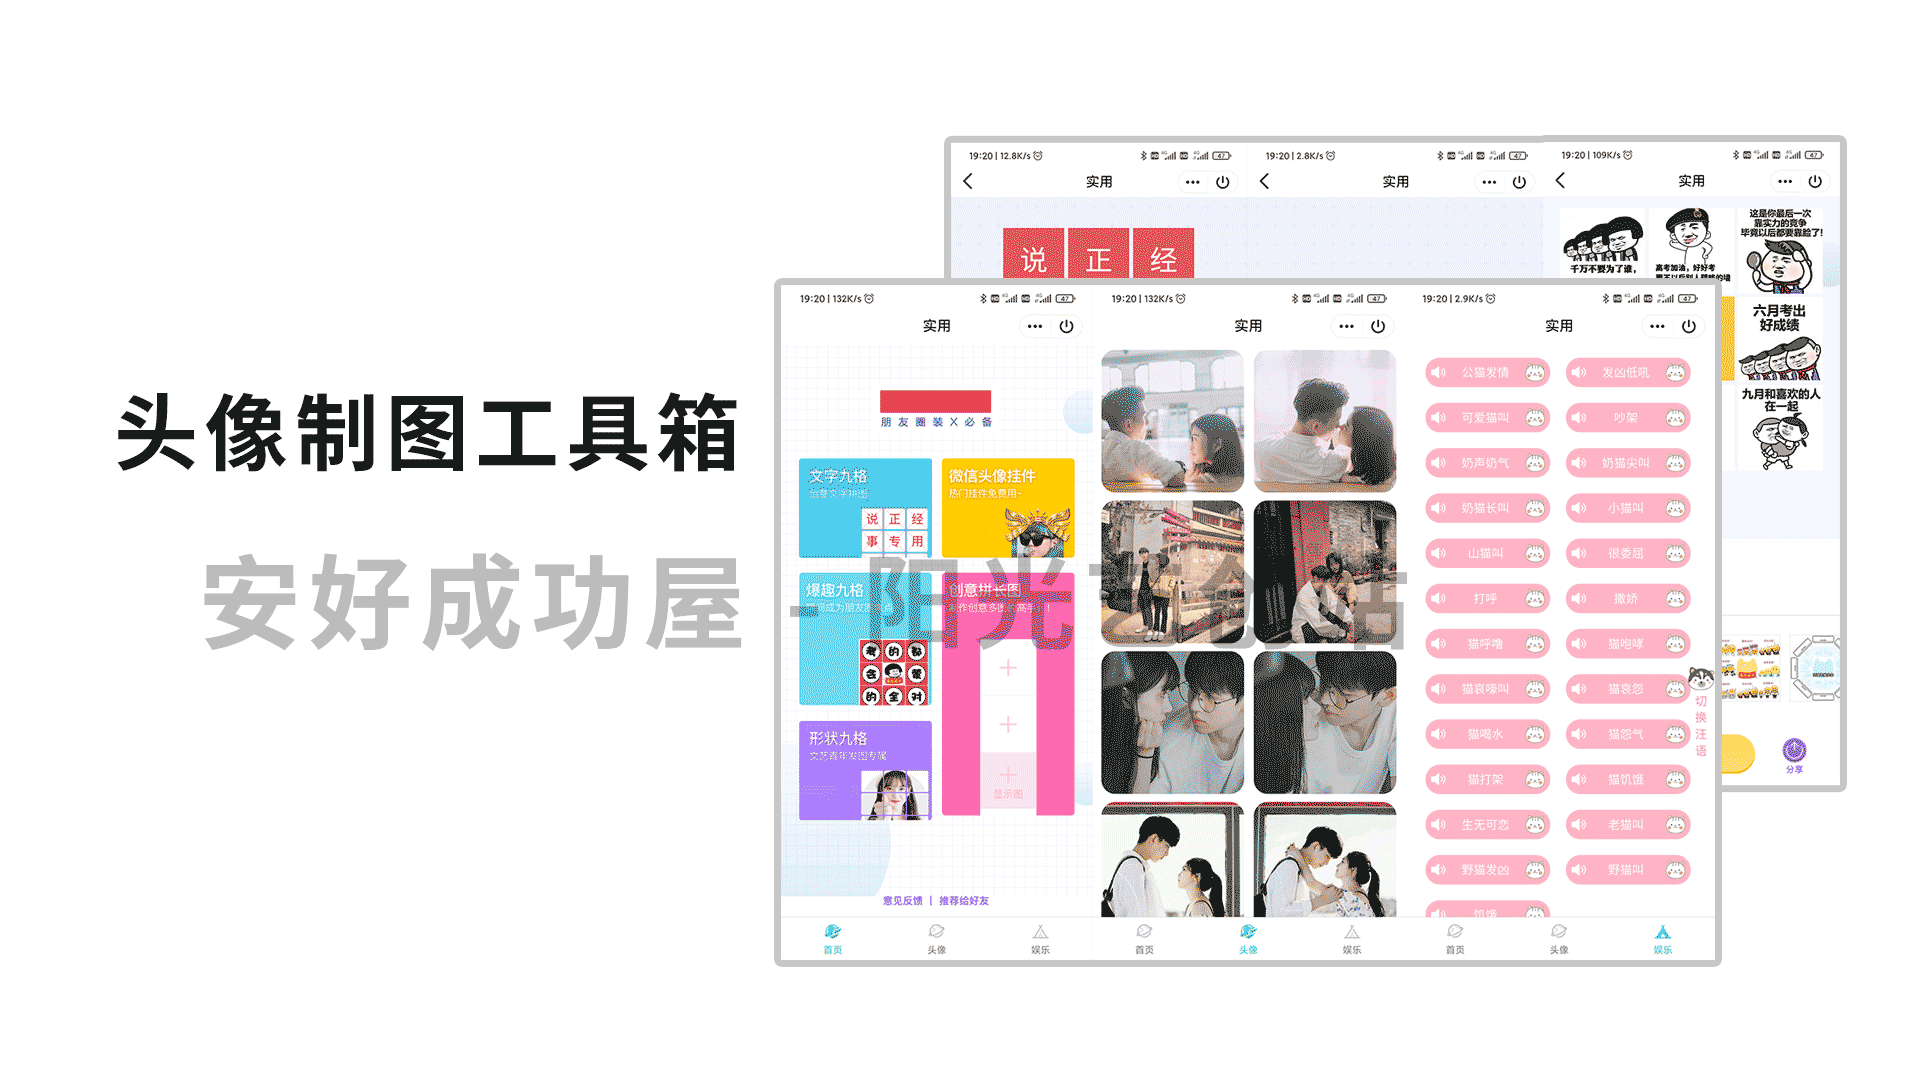 QQ微信头像制图工具箱小程序纯前端源码